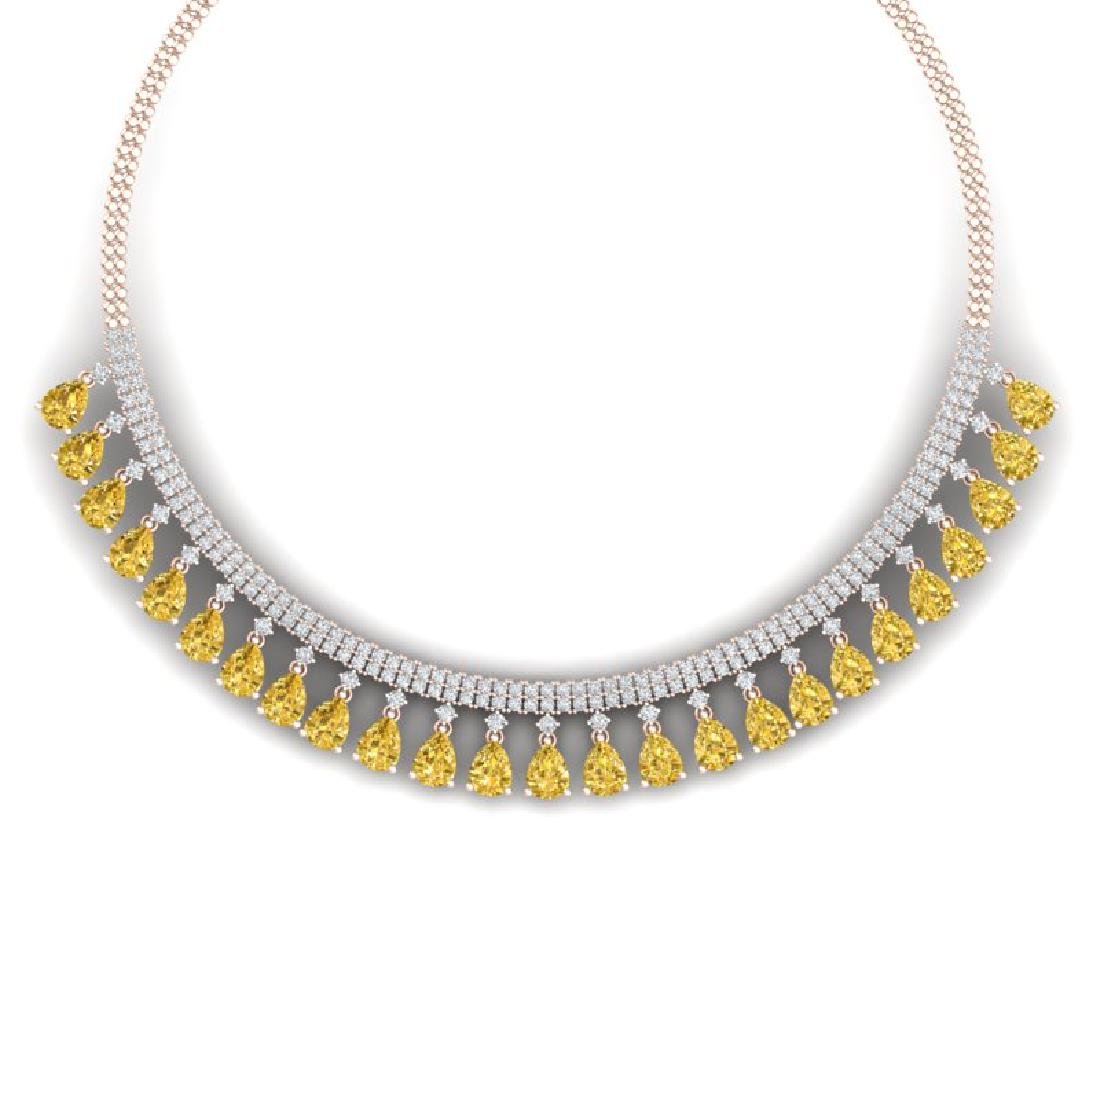 39.66 CTW Royalty Canary Citrine & VS Diamond Necklace